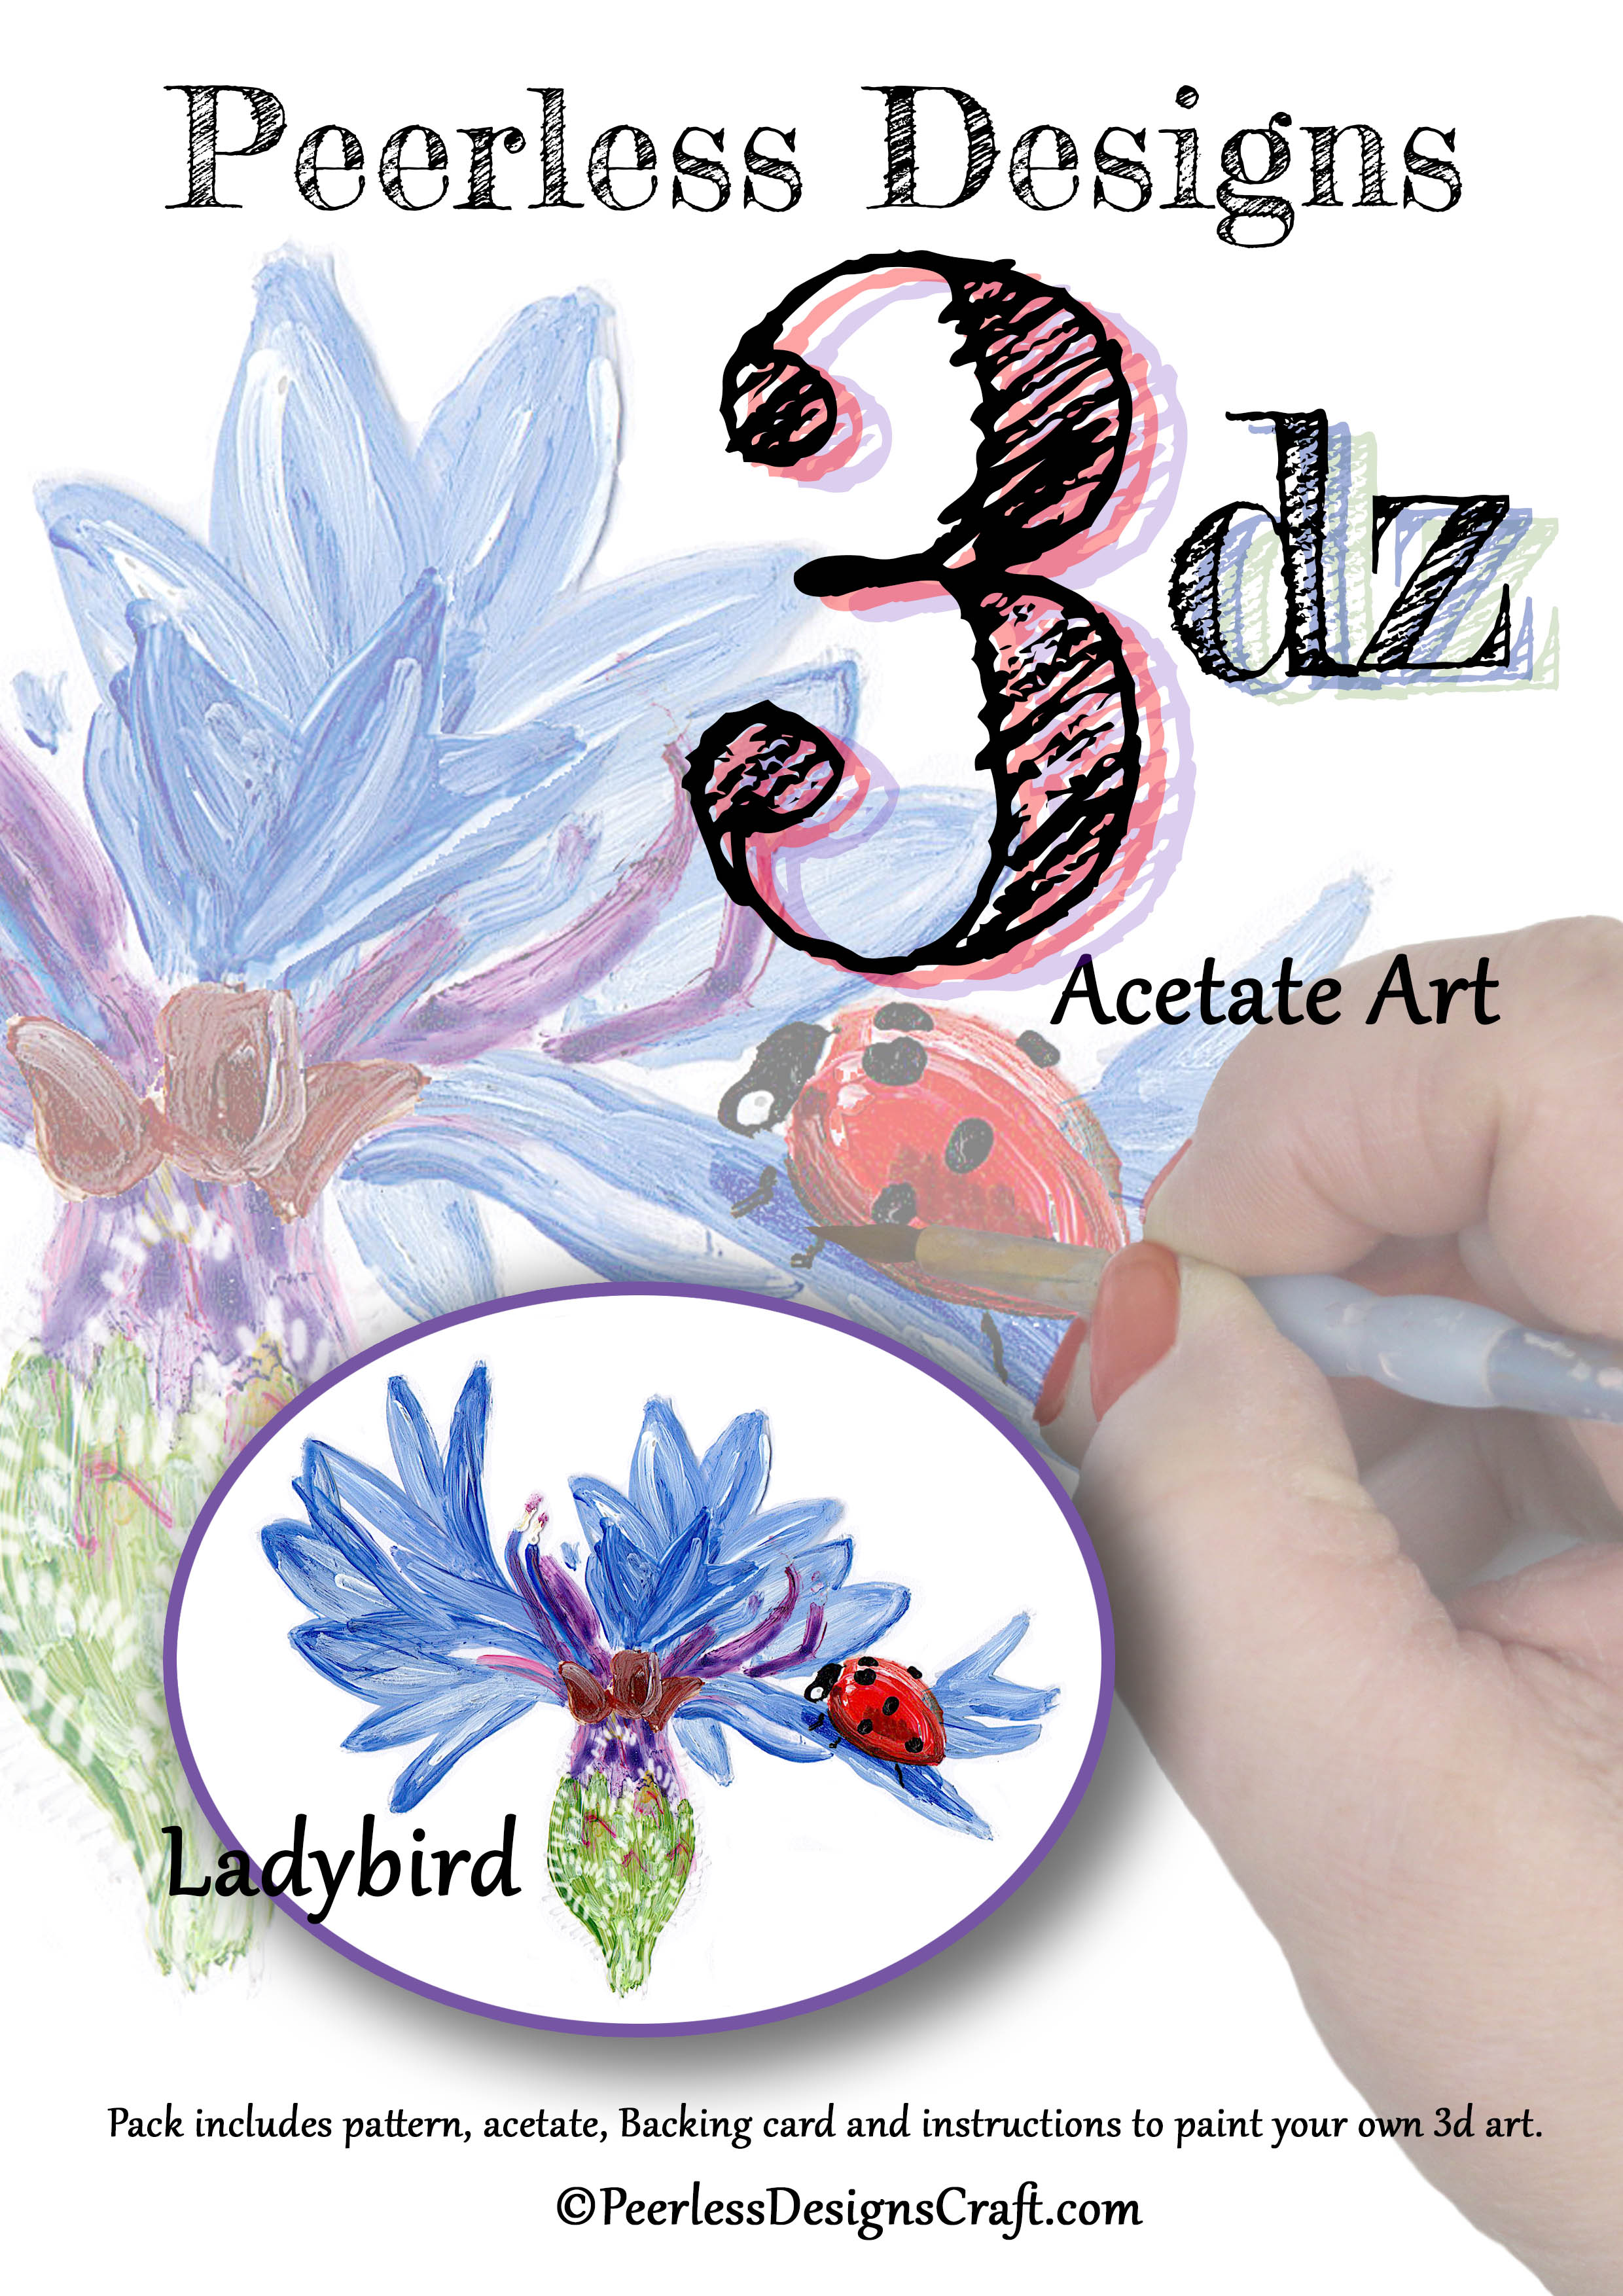 cover ladybird.jpg